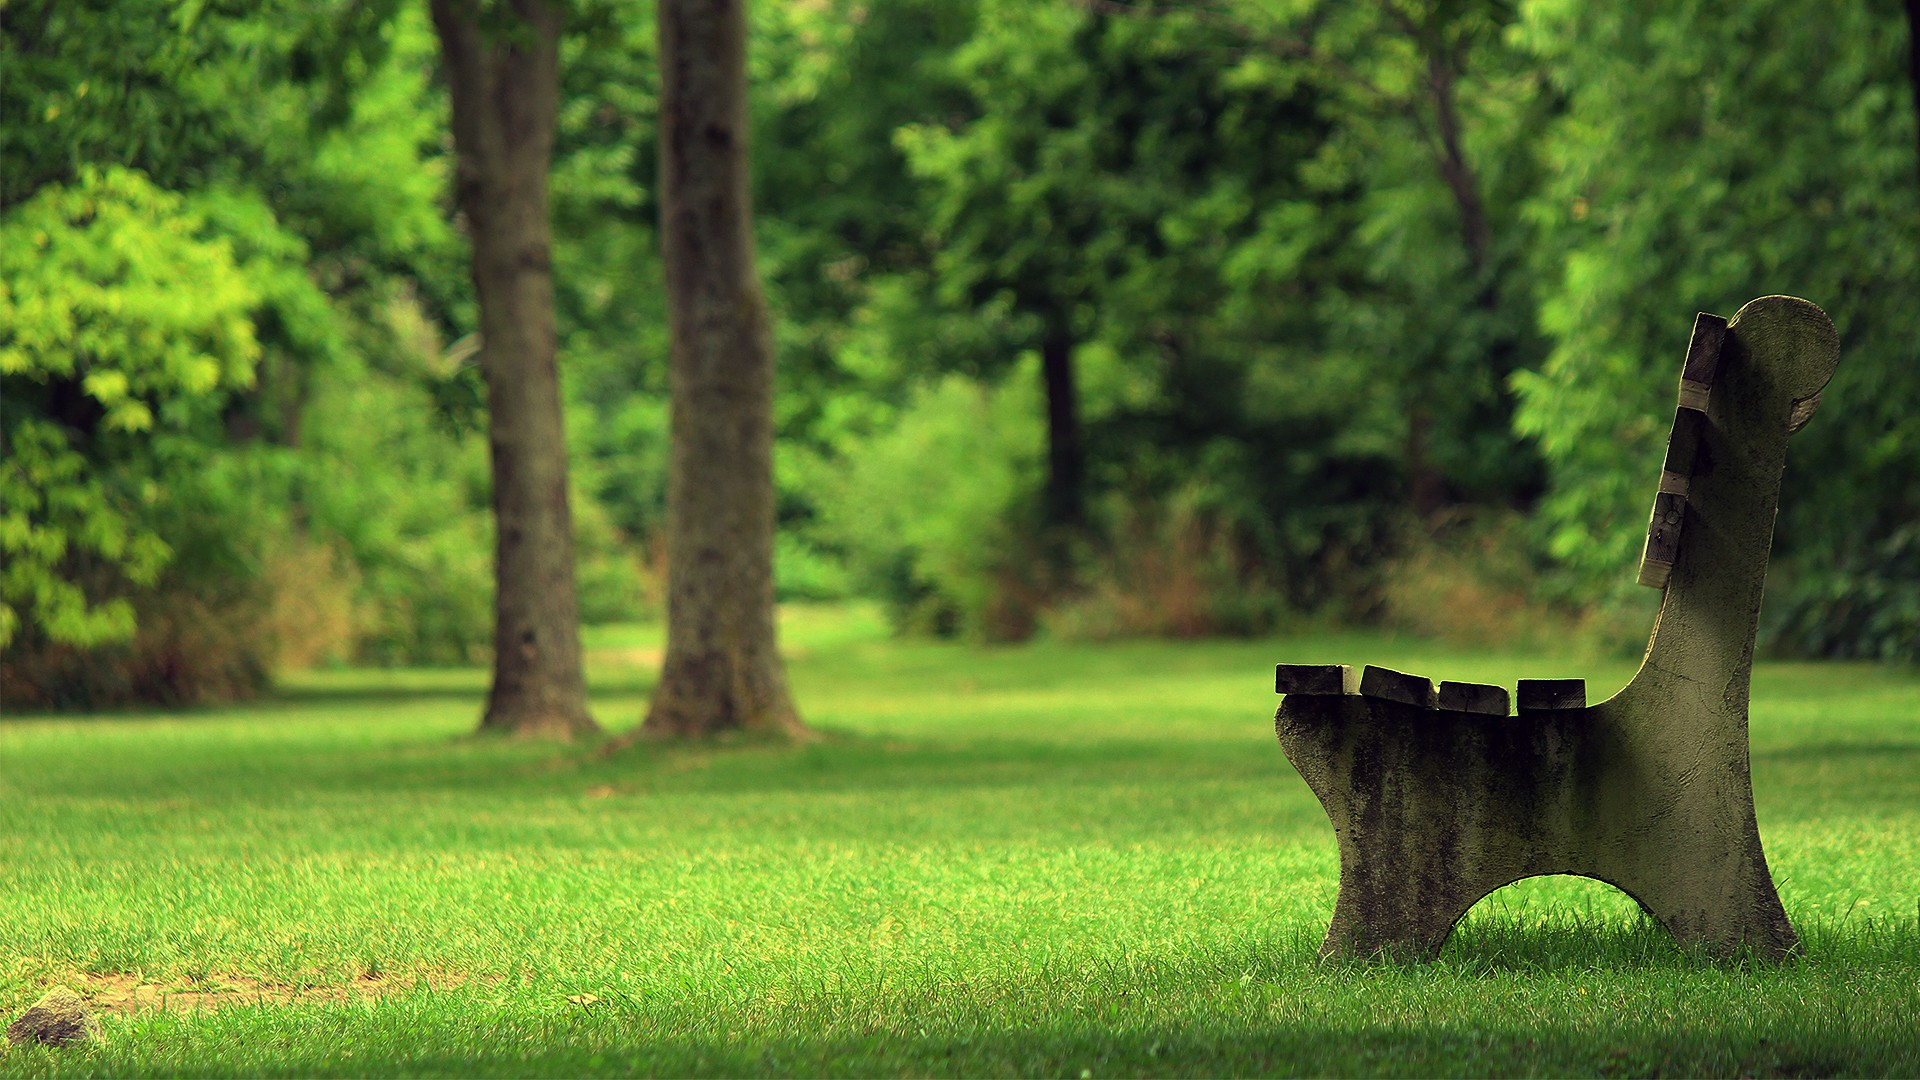 Bench green park